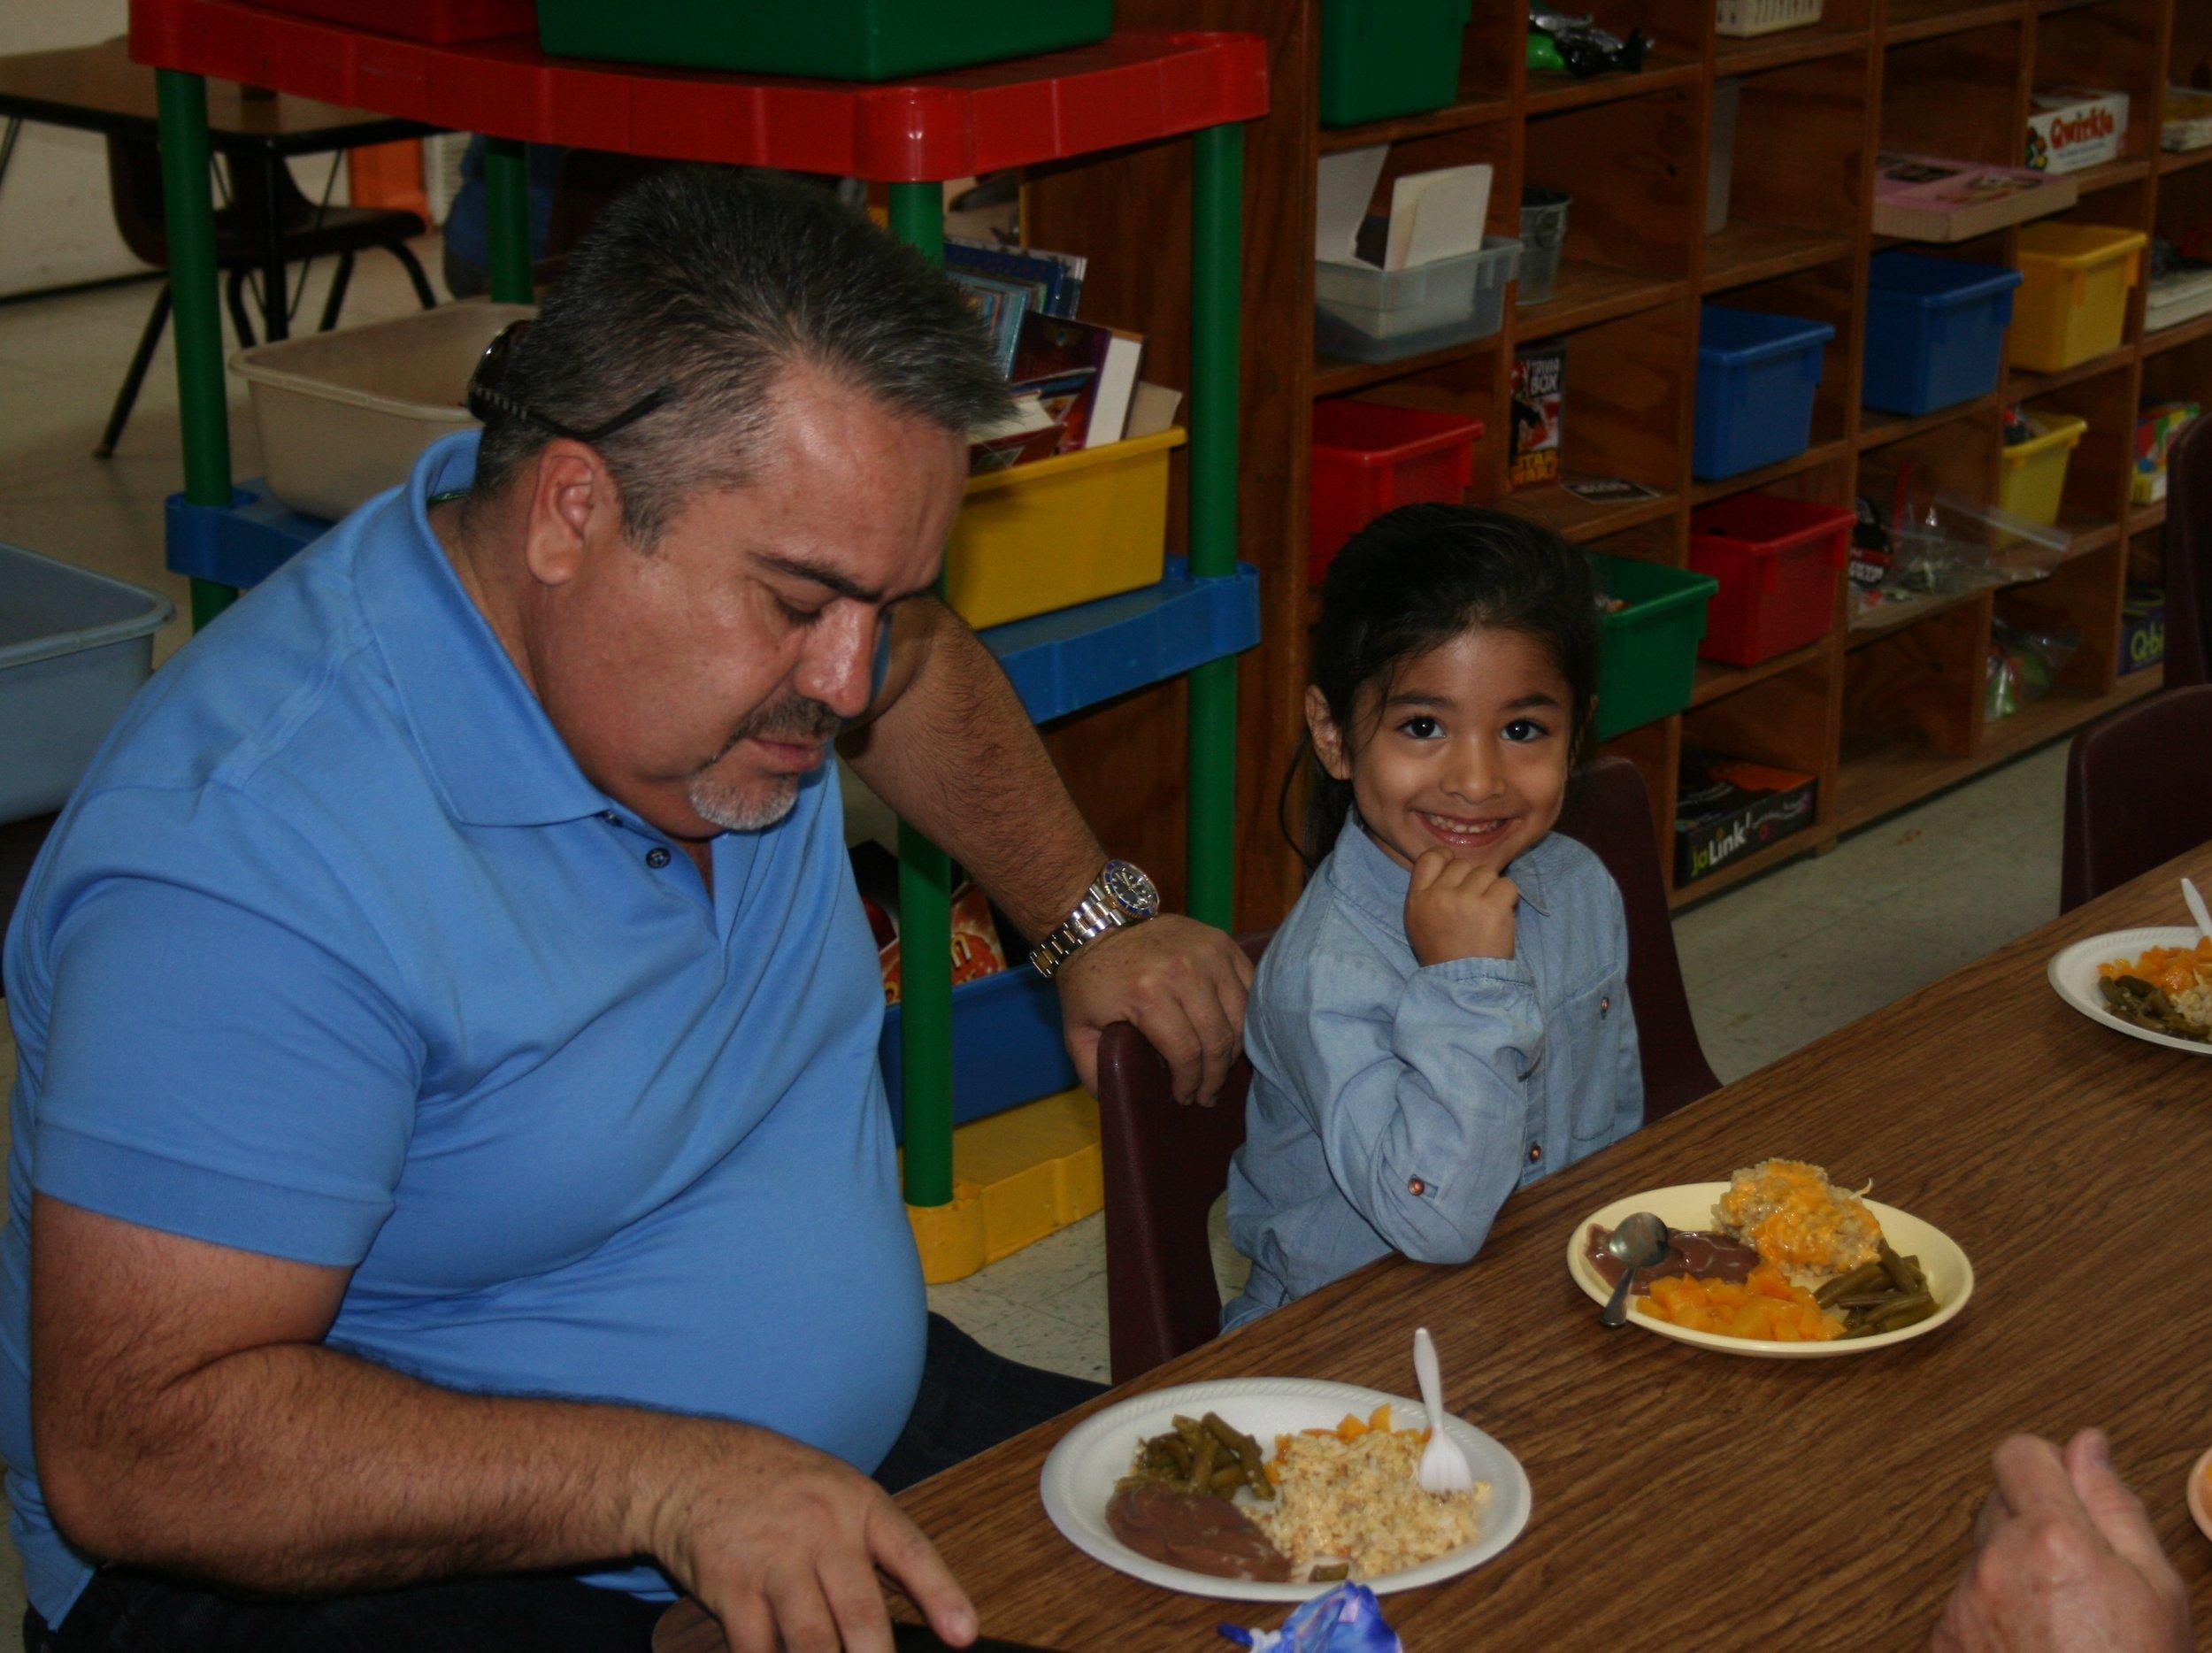 grandparents lunch 9-8-17 025.JPG